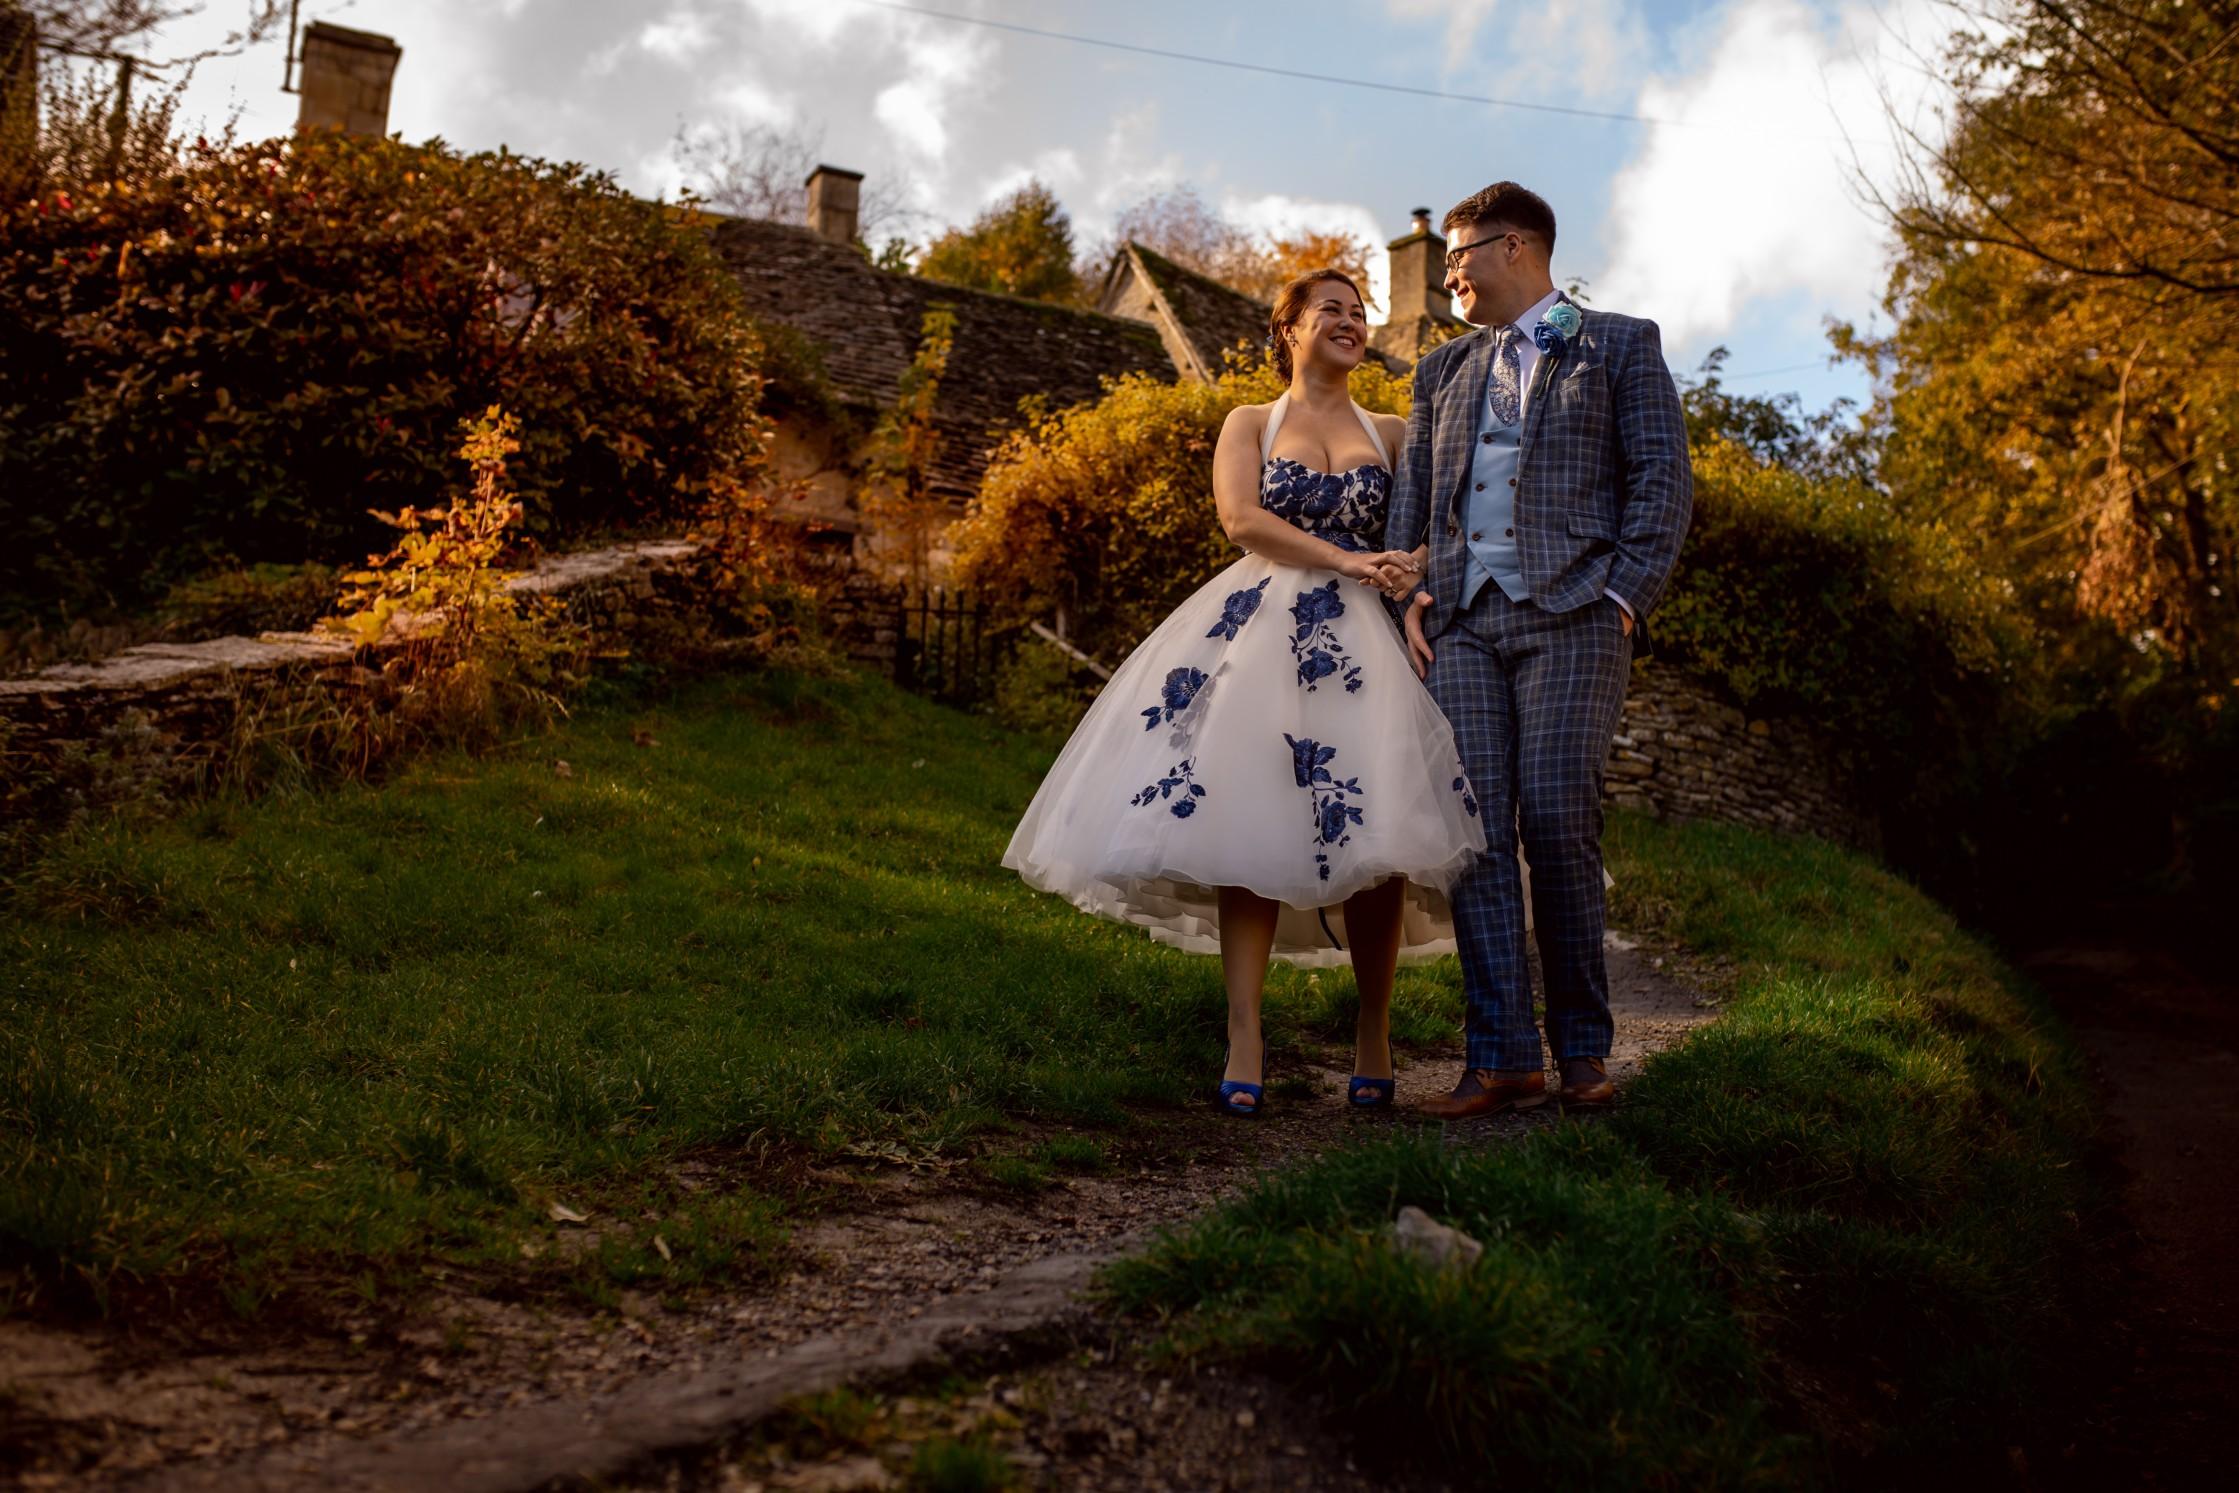 cotswolds wedding shoot - creative covid wedding - artistic wedding photos